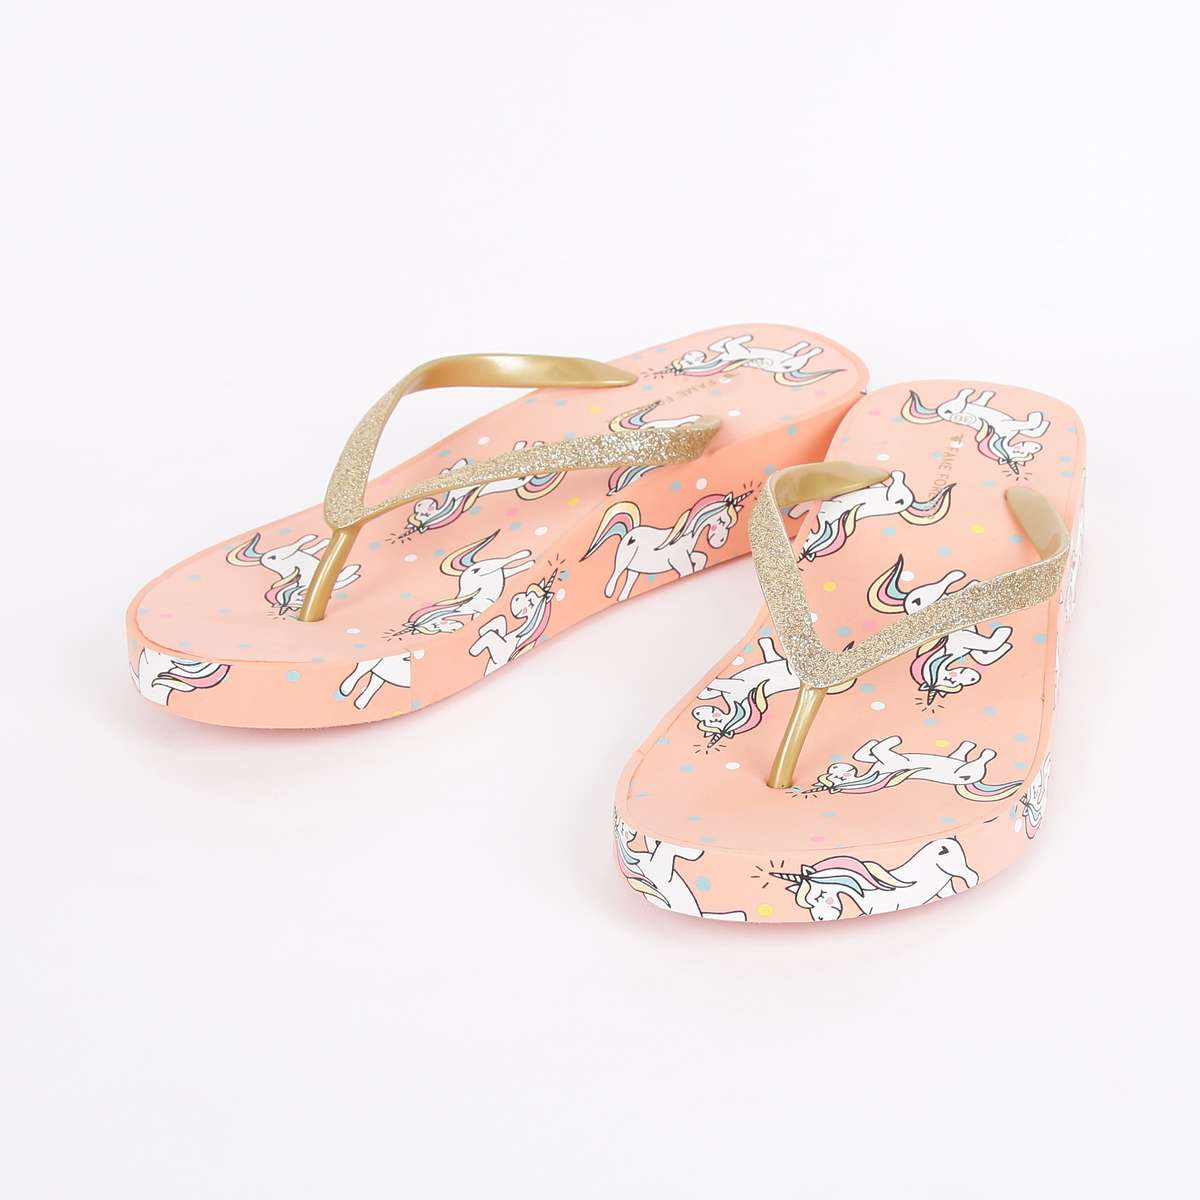 2.FAME FOREVER Girls Printed Flip Flops